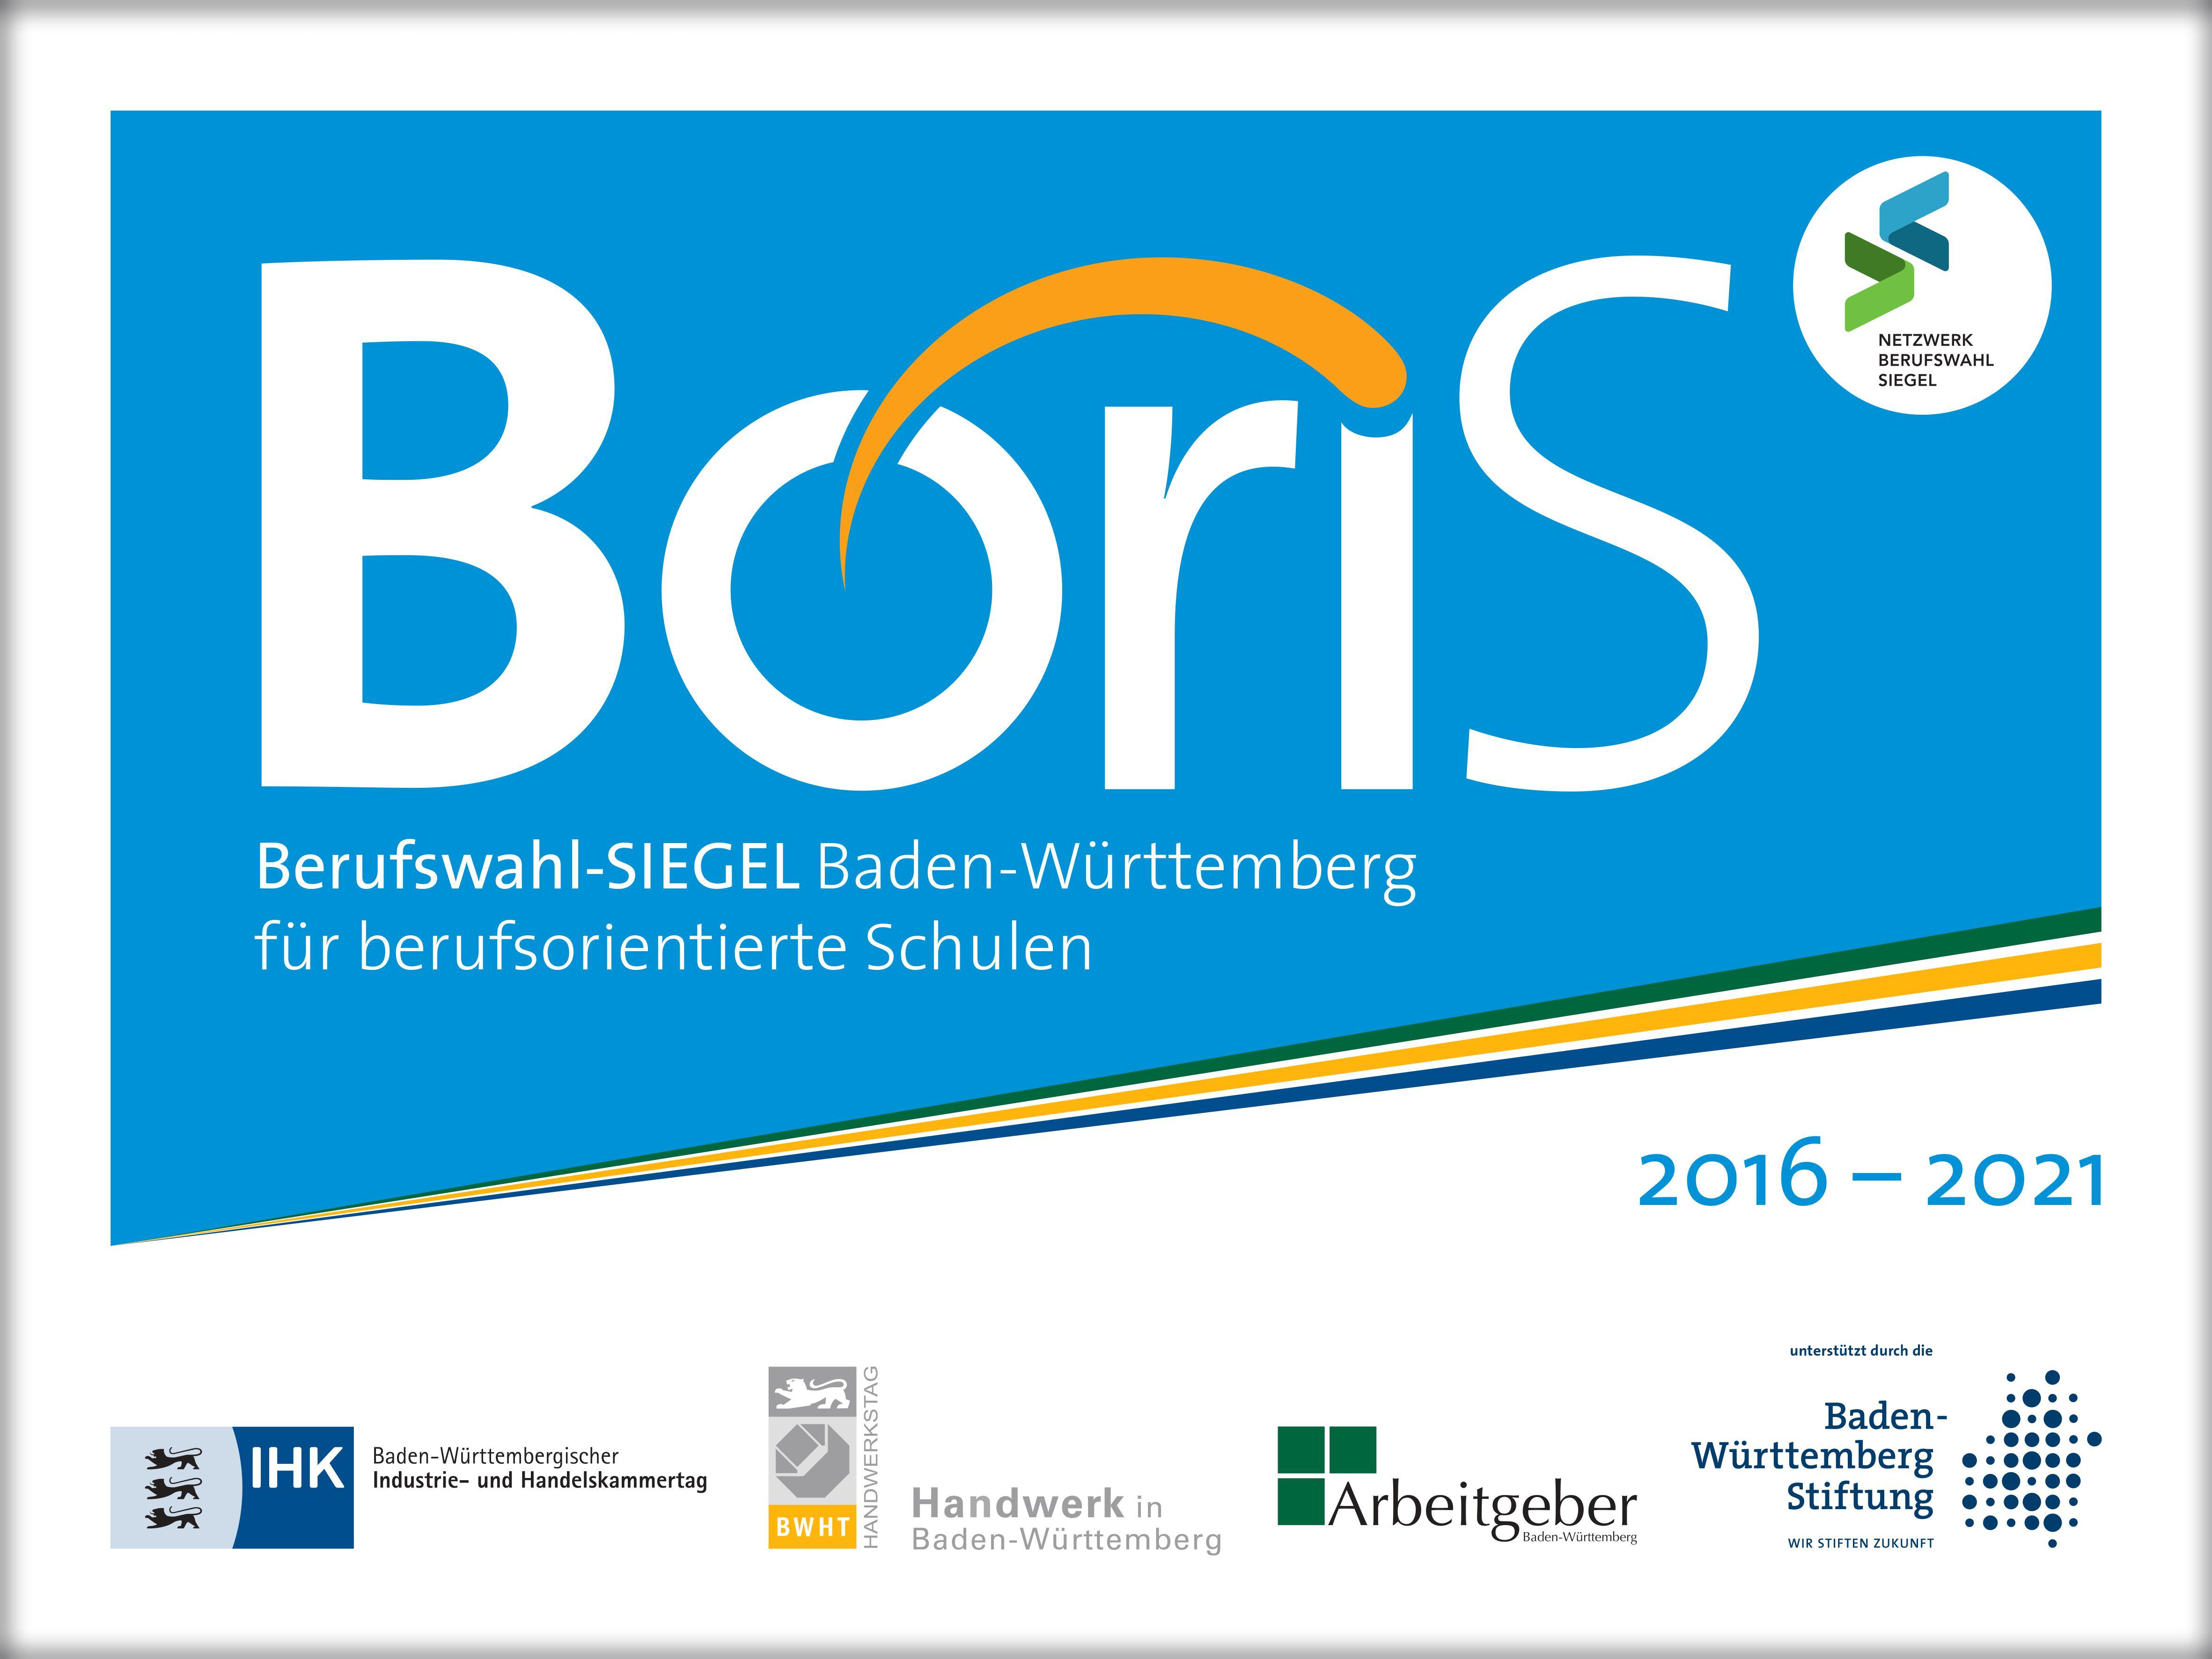 2016 BORIS-Siegel